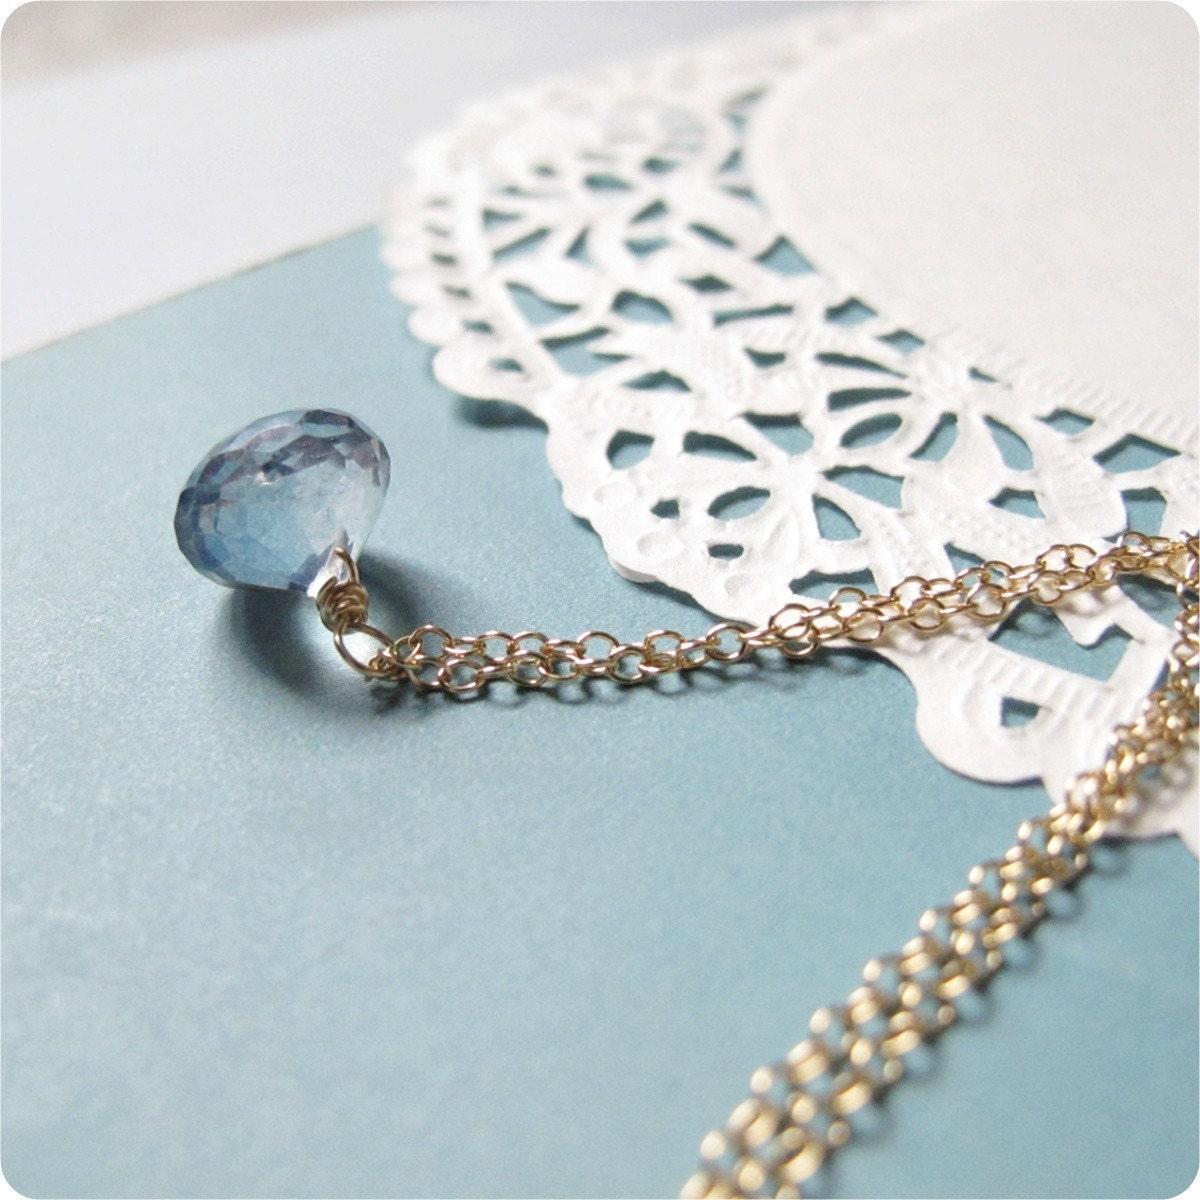 pear shaped blue mystic quartz pendant giveaway